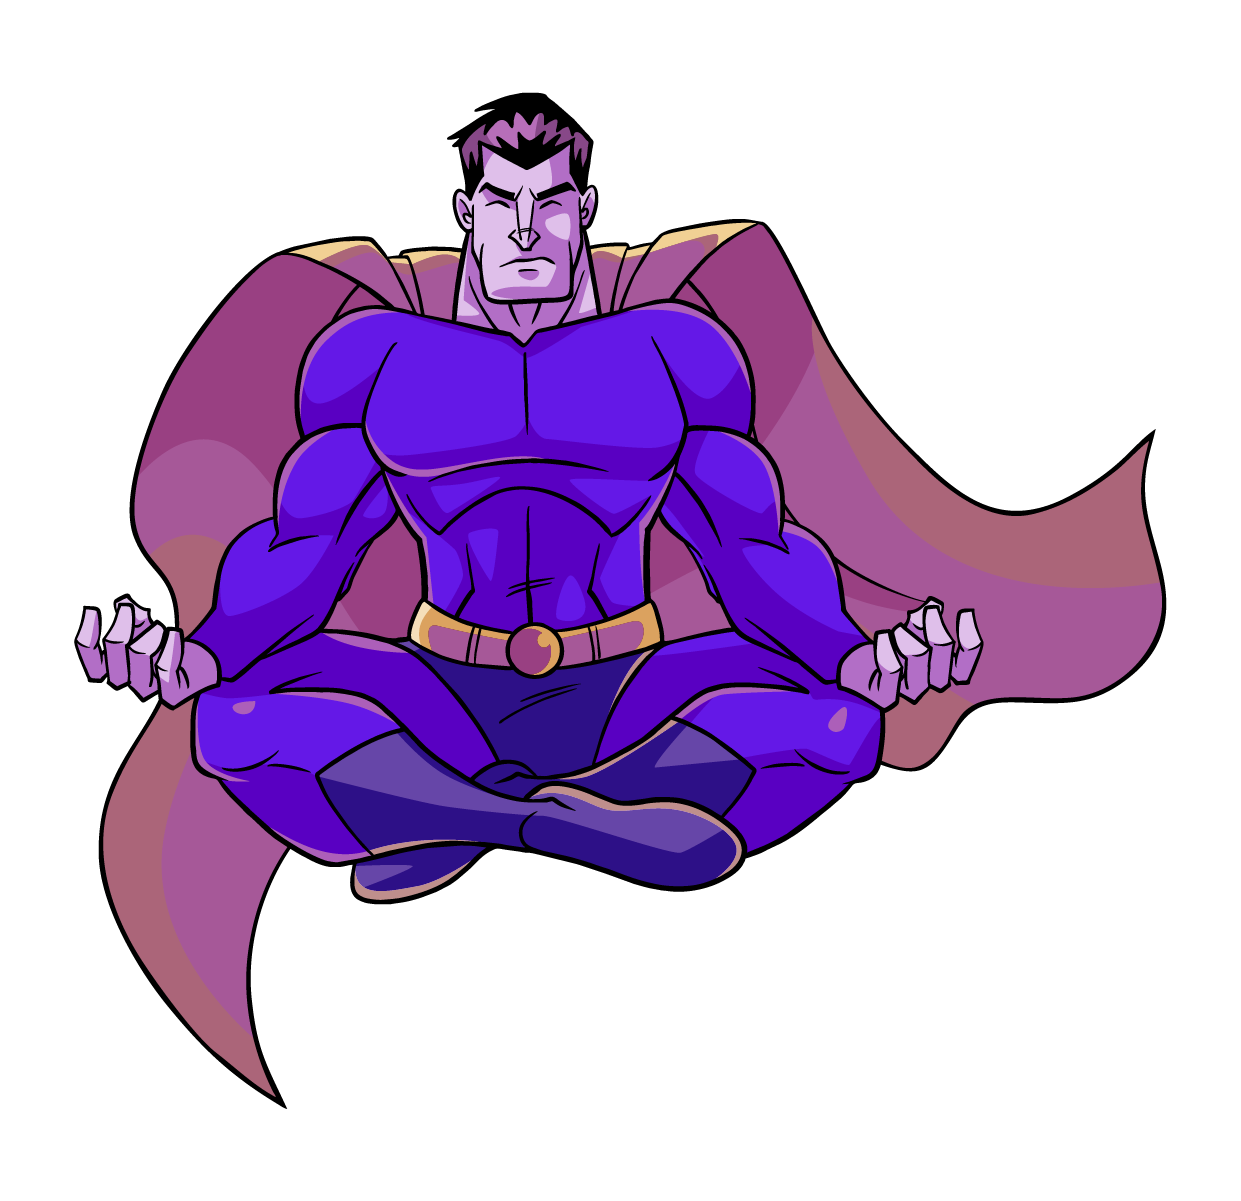 superhero 3 1